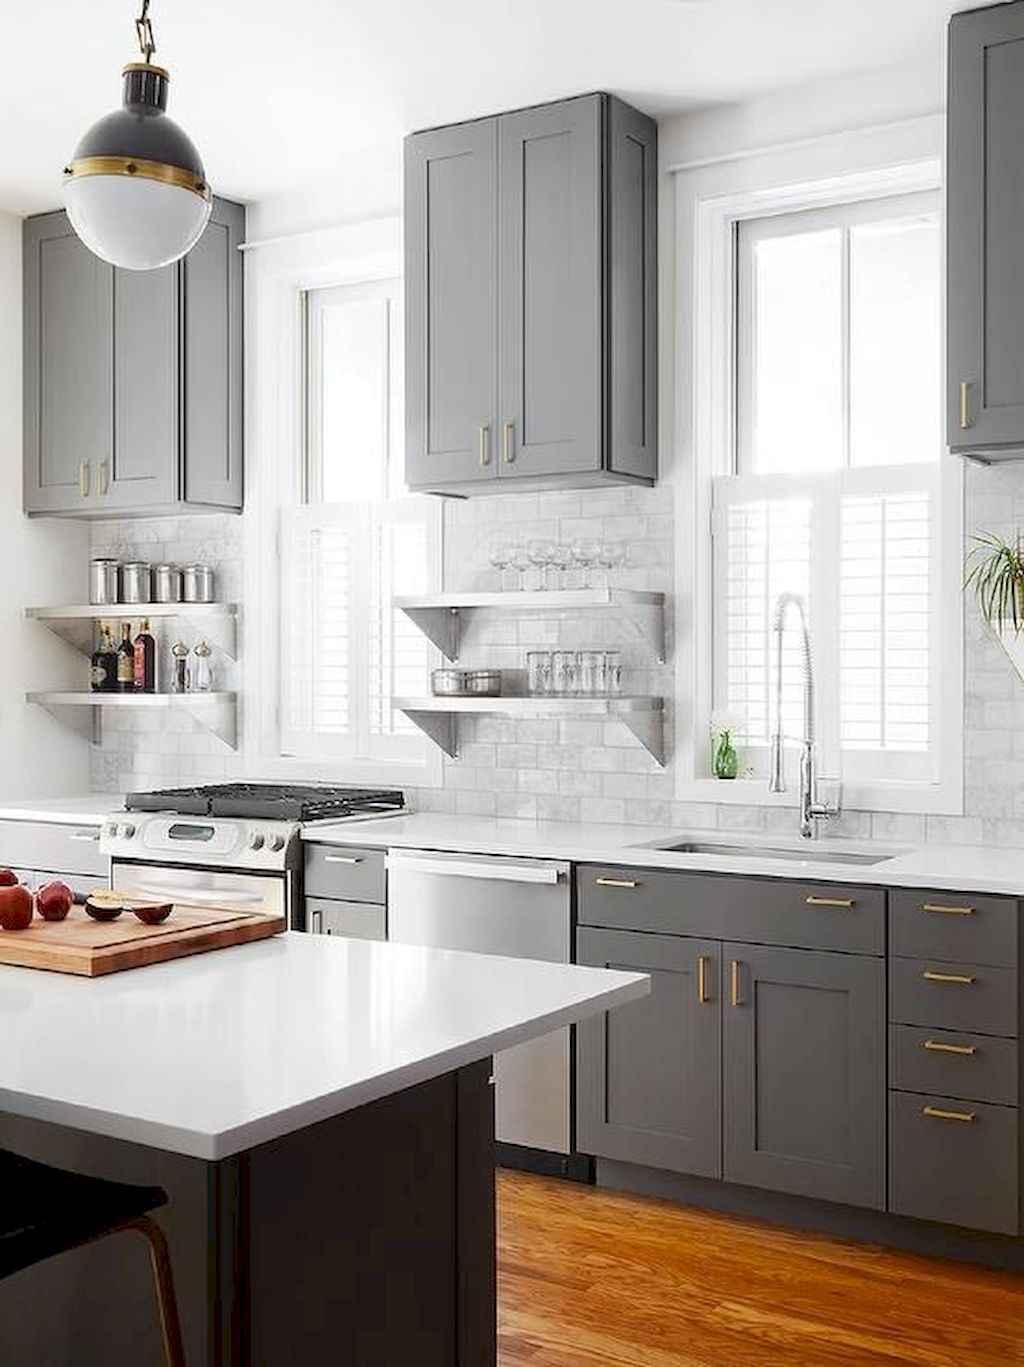 Gorgeous gray kitchen cabinet makeover ideas (43)